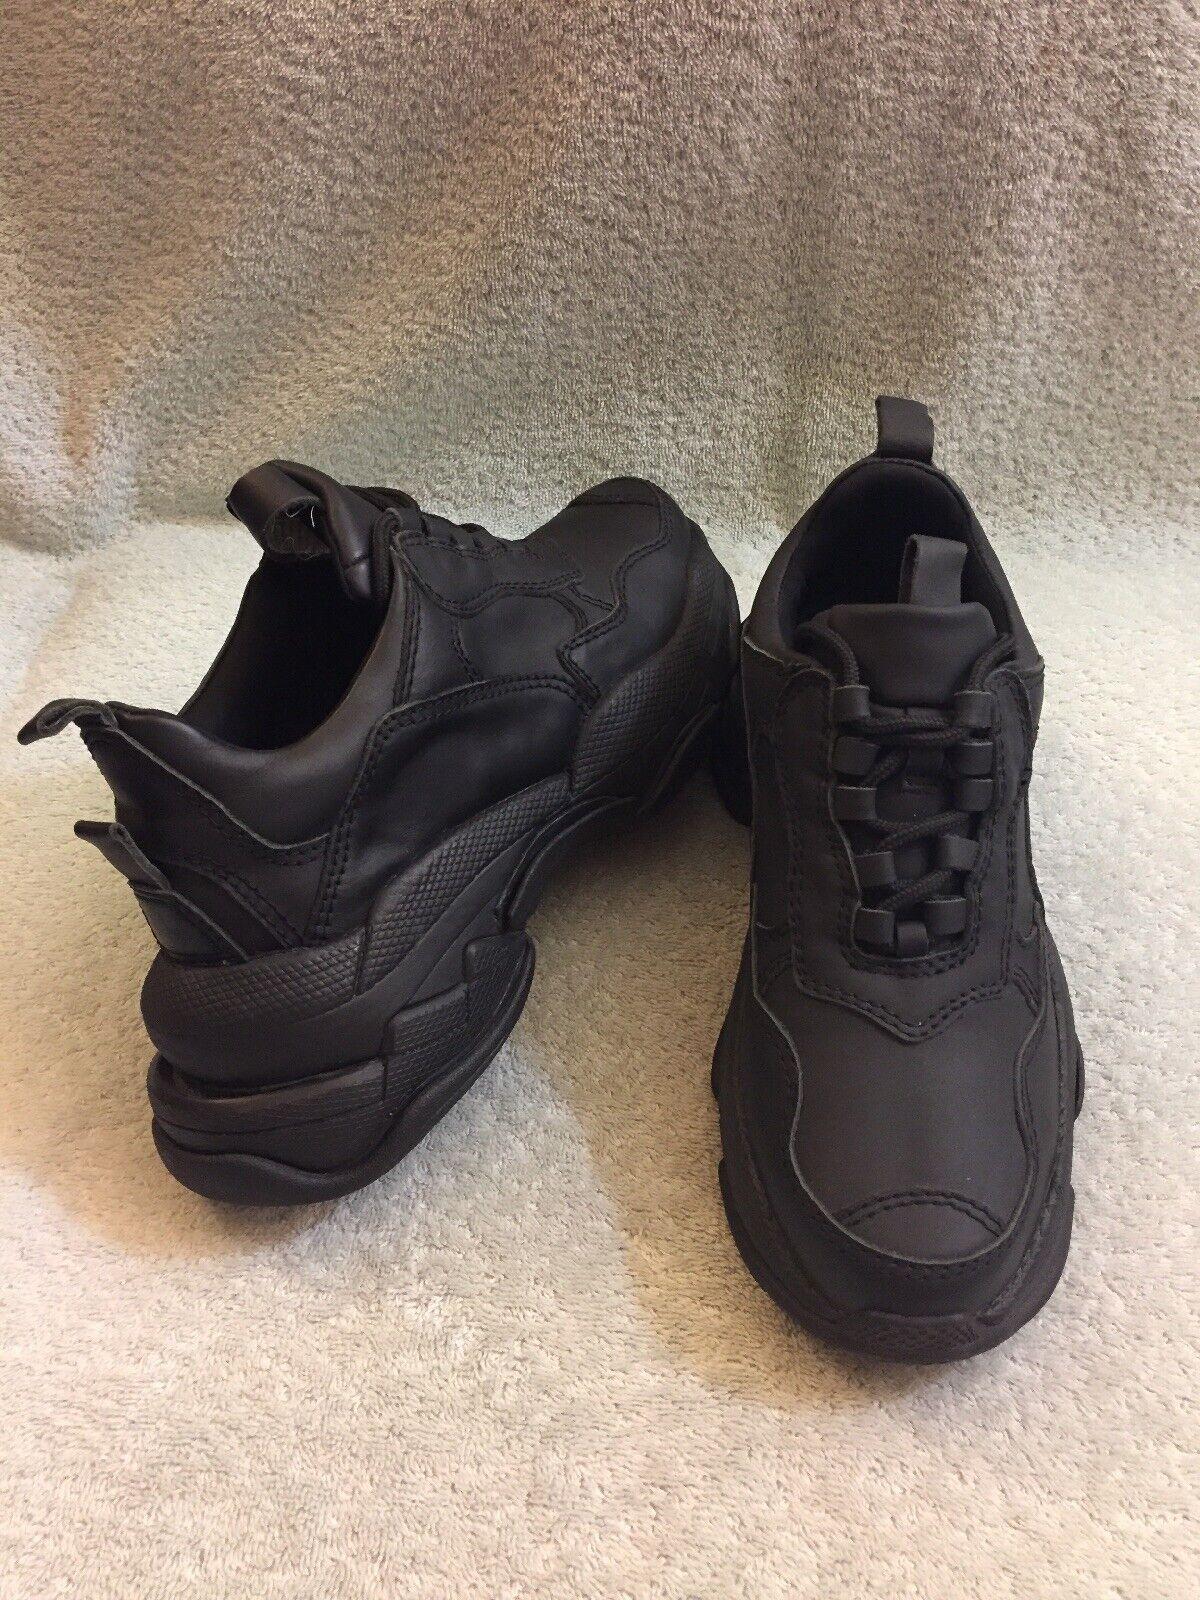 Jeffrey campbell scarpe da ginnastica ginnastica ginnastica  good condition donna's Dimensione 7.5 nero ab6cc9